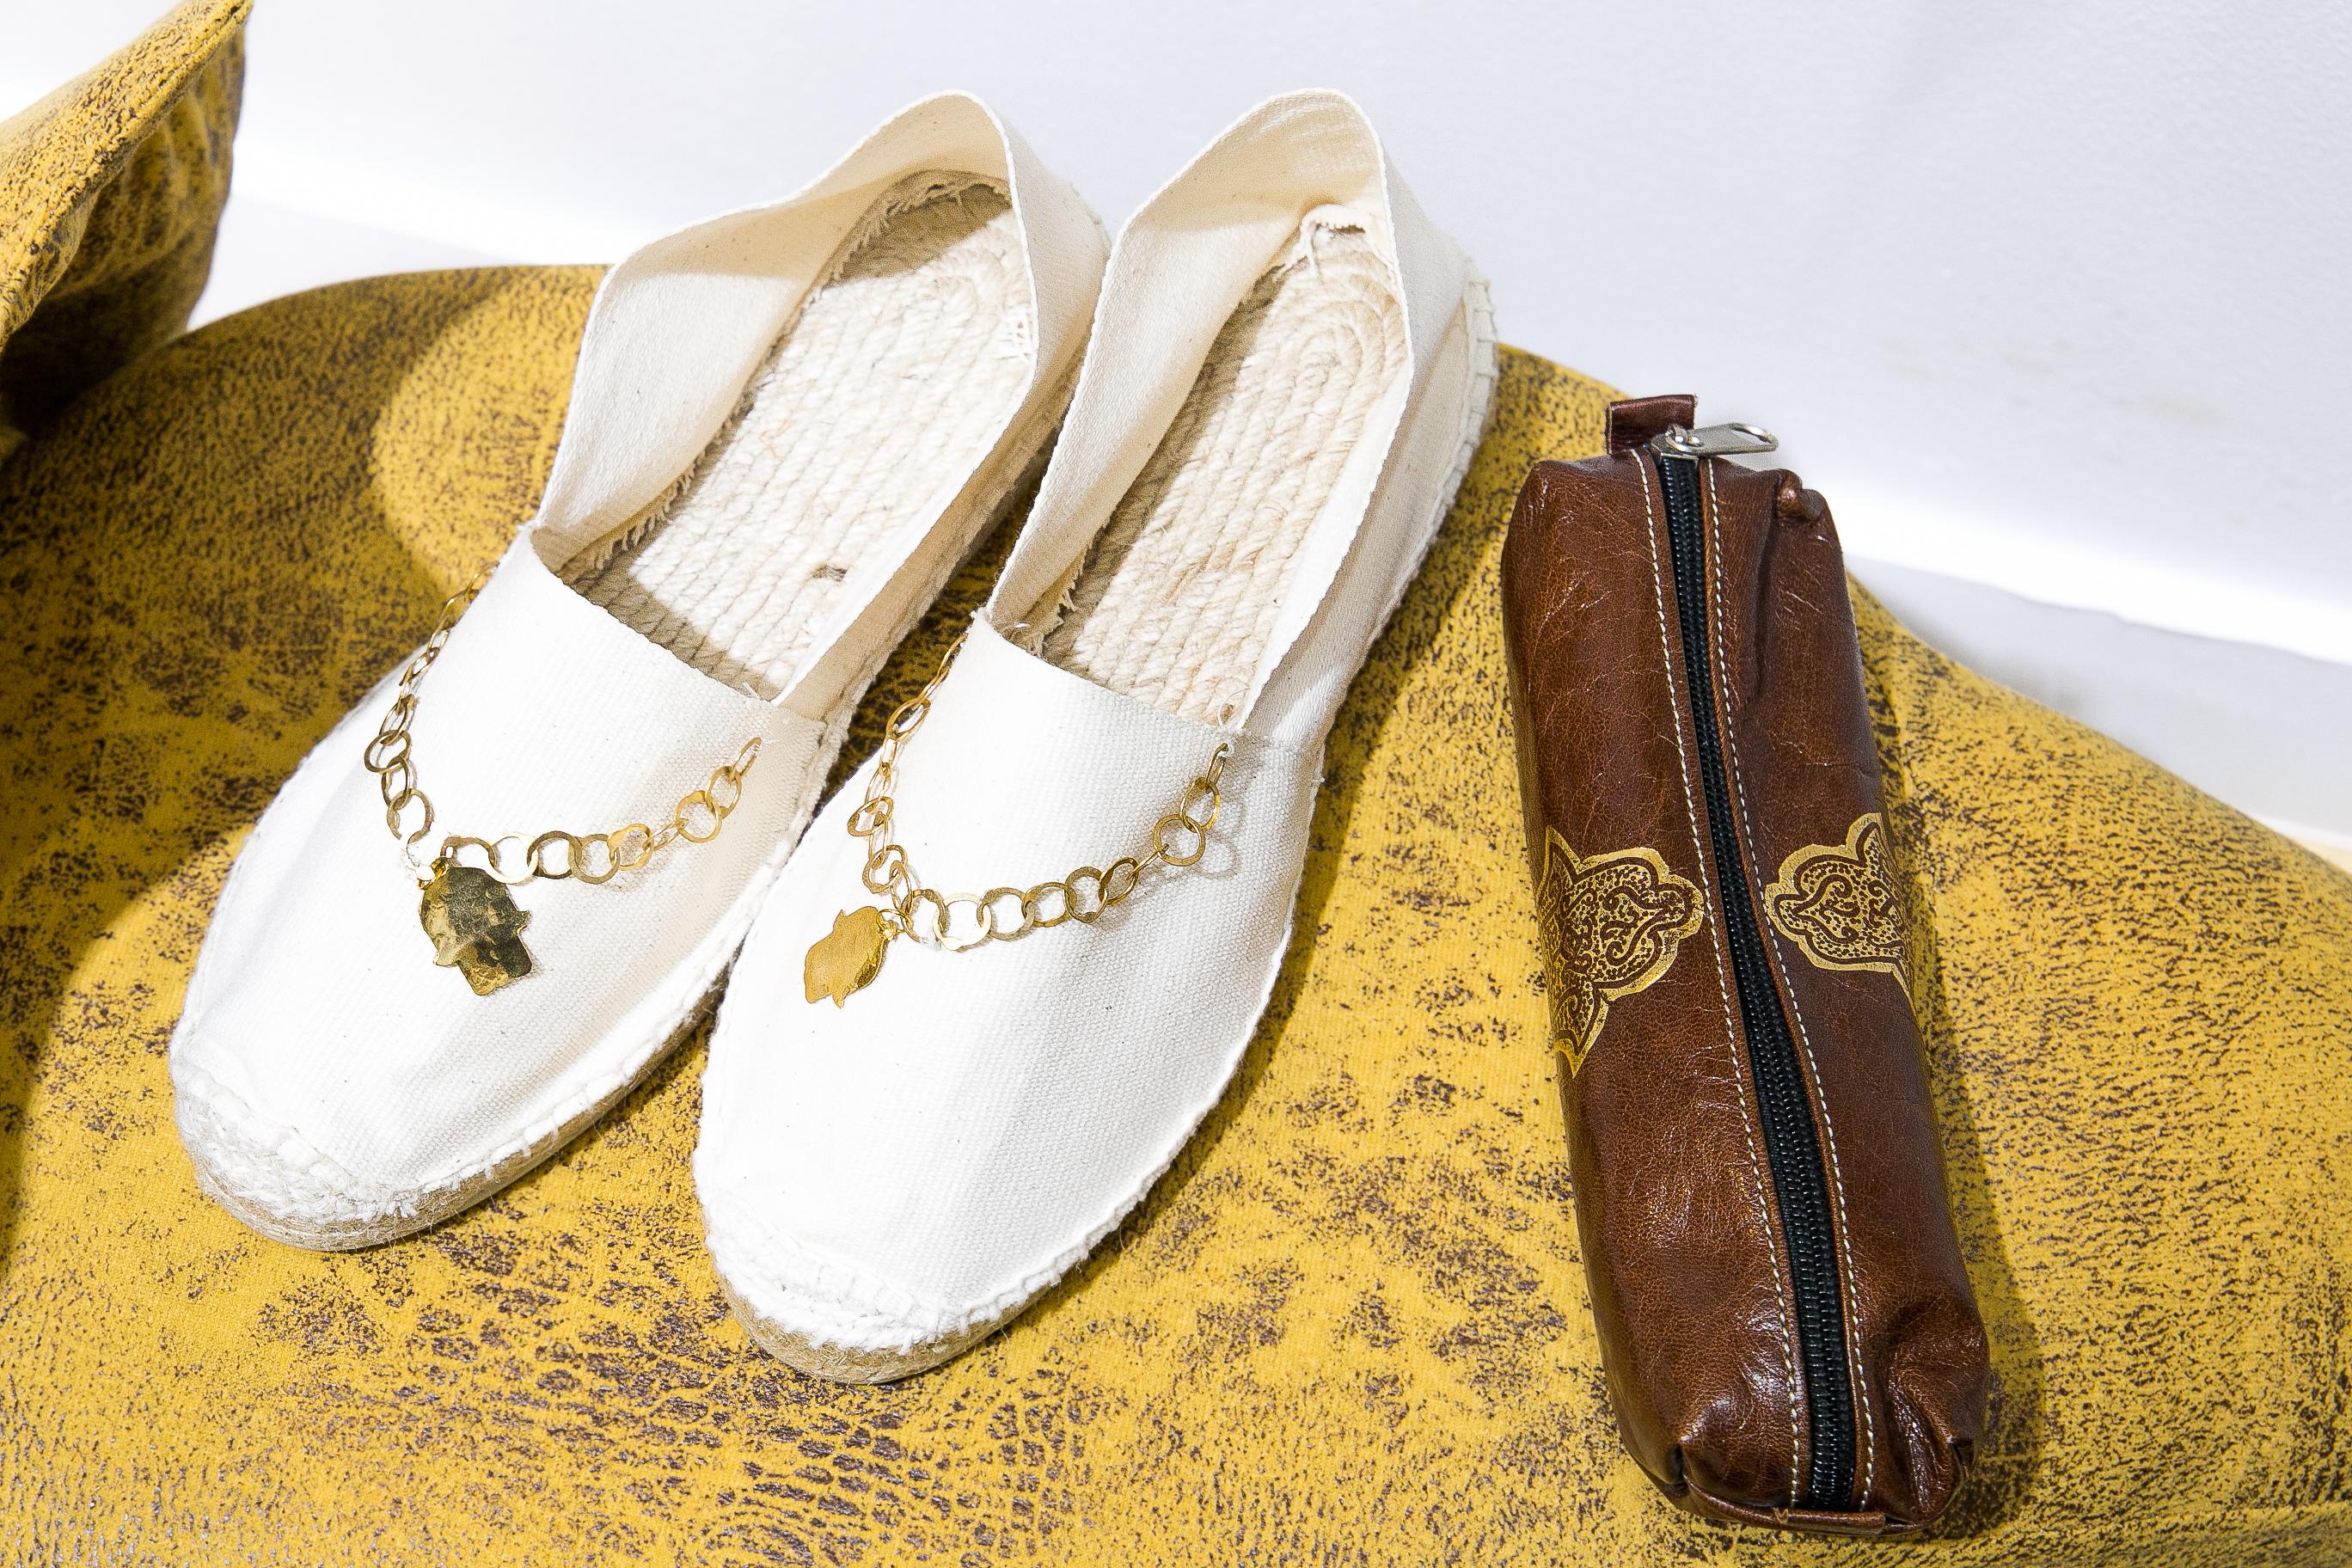 Khomssa handcraft espadrilles, espadrilles, slow fashion, sustainable fashion, eco-friendly fashion, buy espadrilles, buy espadrilles Dubai